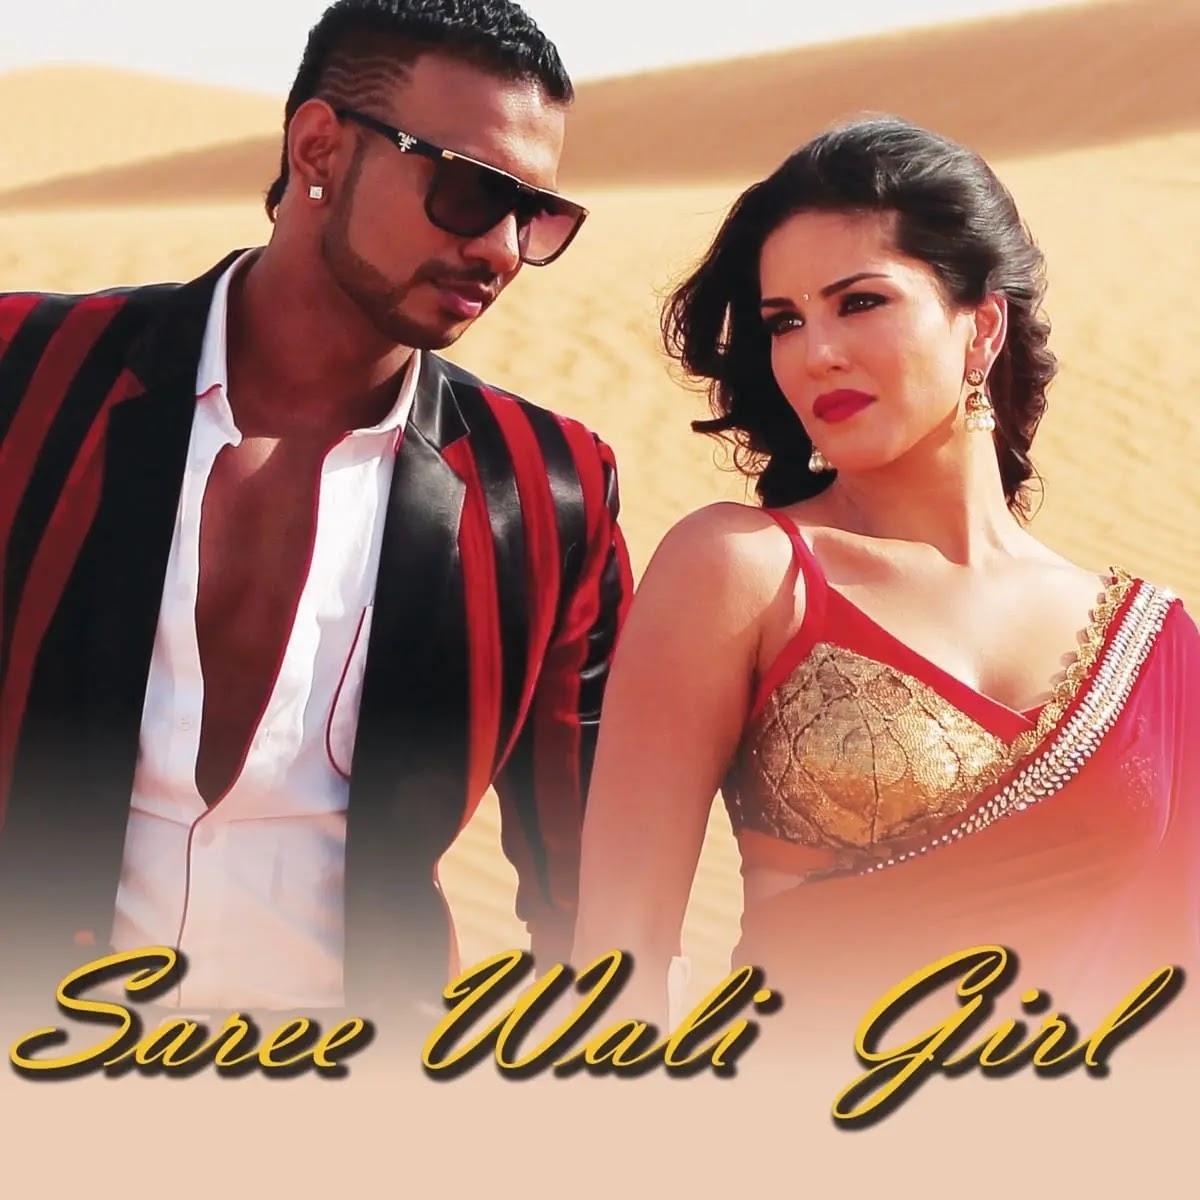 Saree Wali Girl Sunny Leone Song Download MP3 320kbps